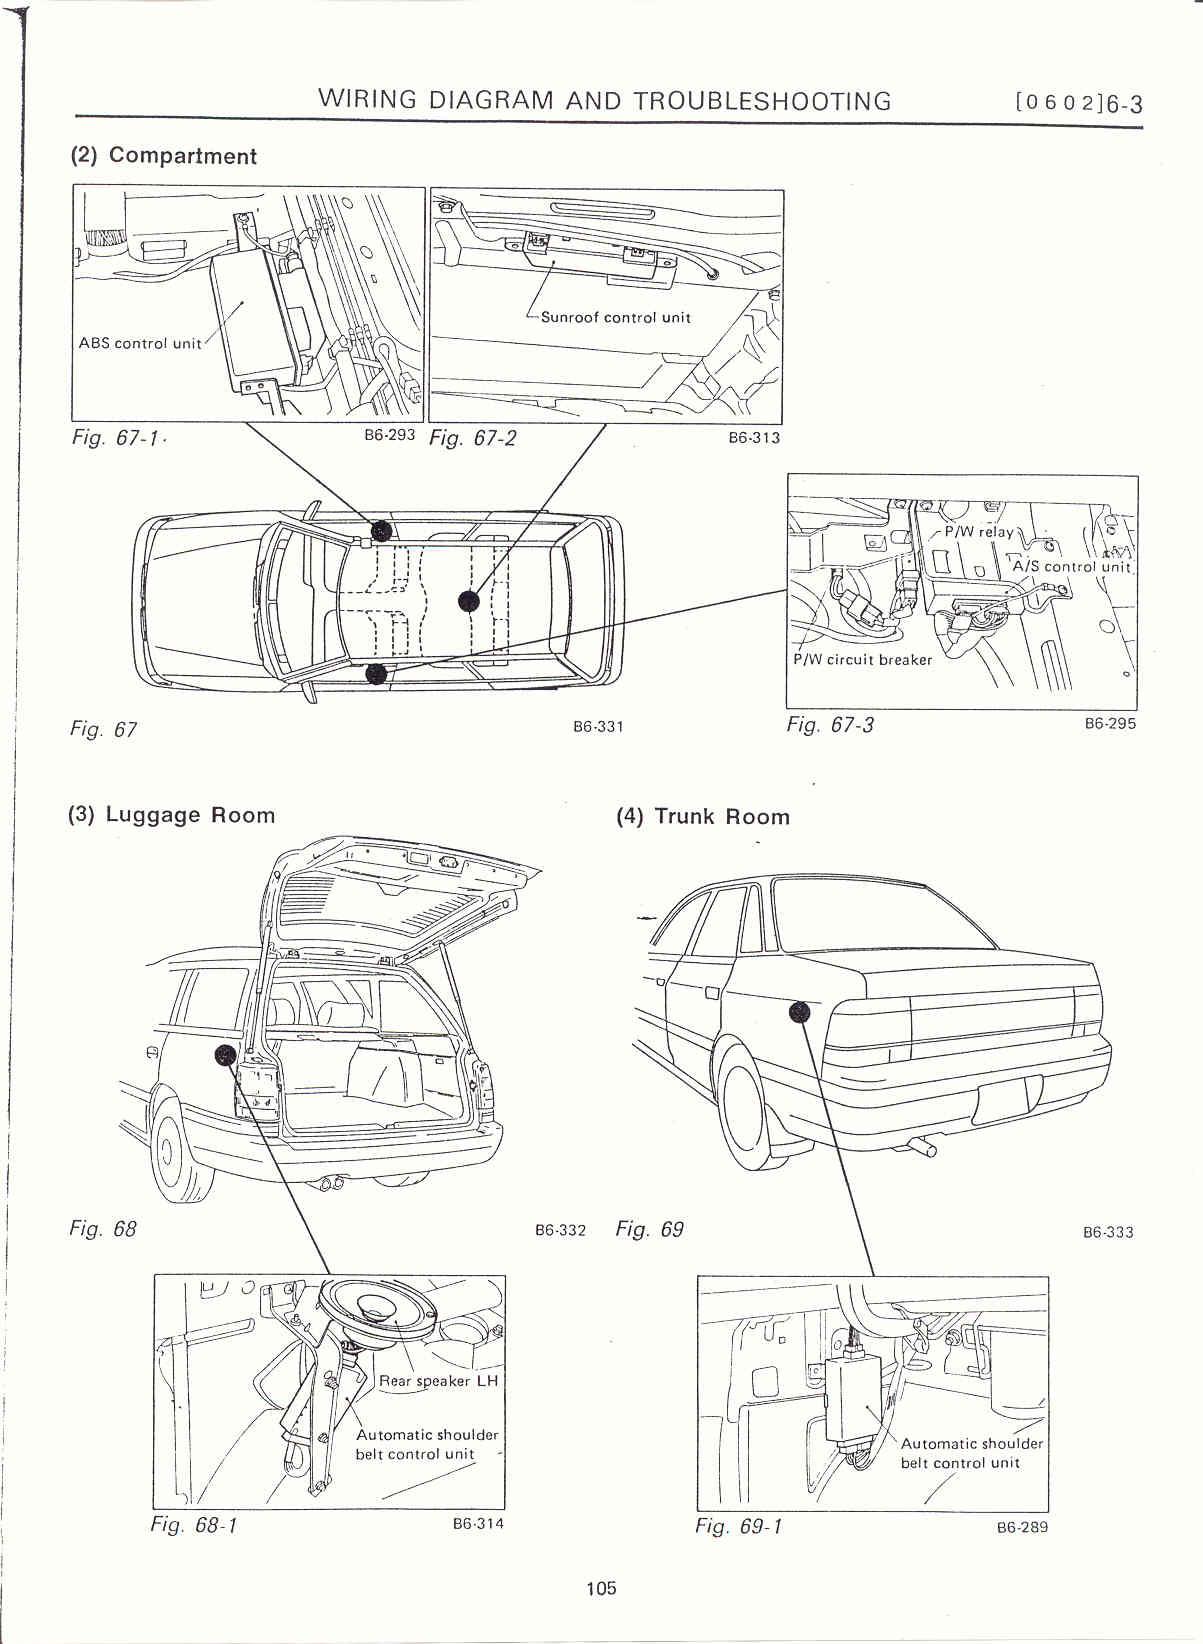 subaru legacy ecu wiring diagram airplane wing parts surrealmirage - swap electrical info & notes